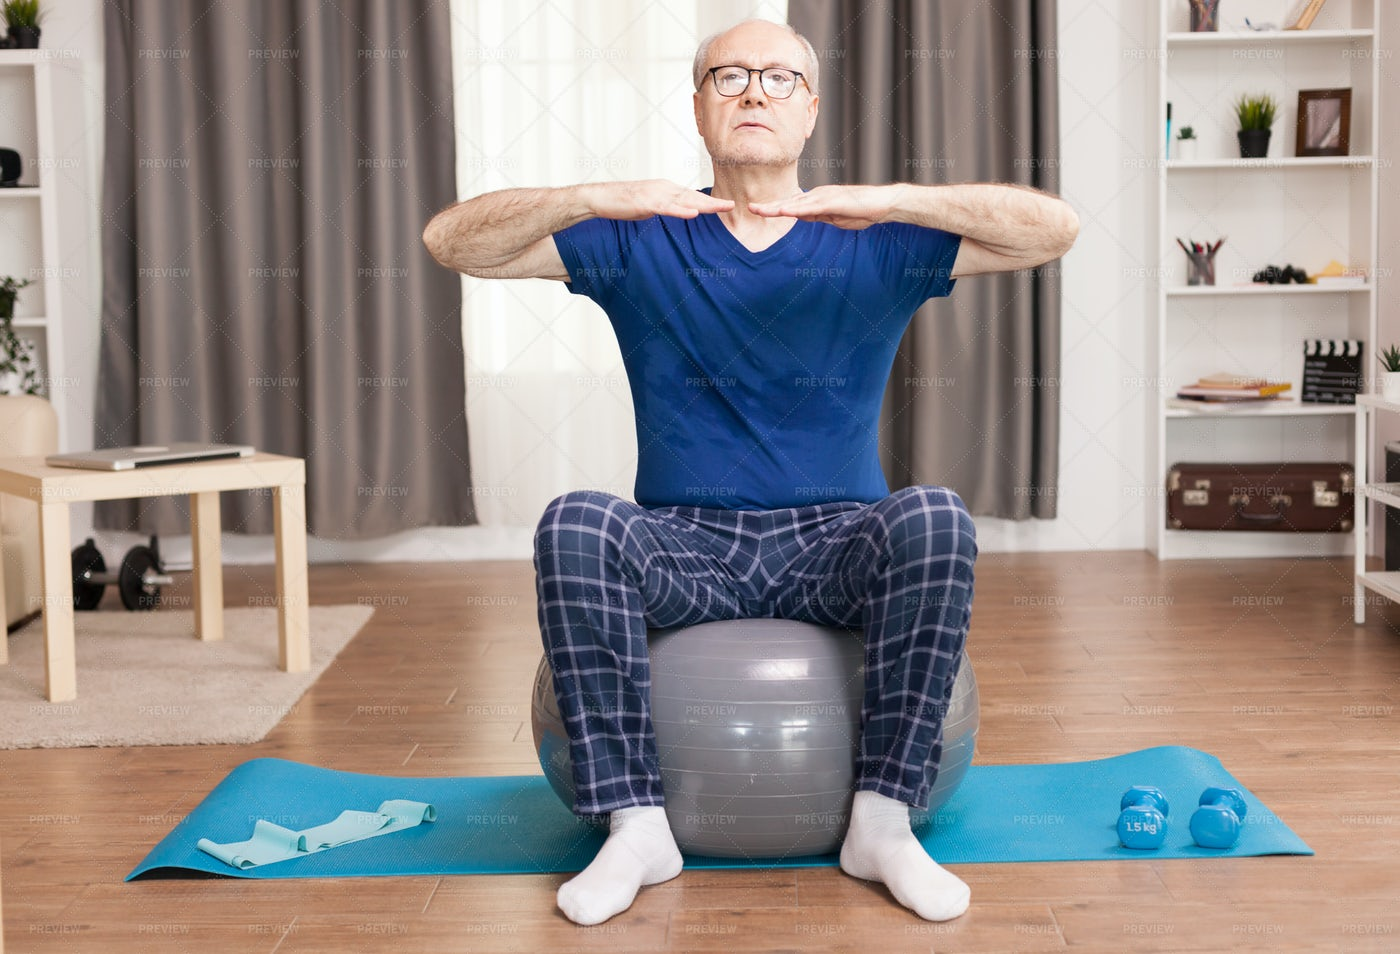 Senior Man Training On Stability Ball: Stock Photos